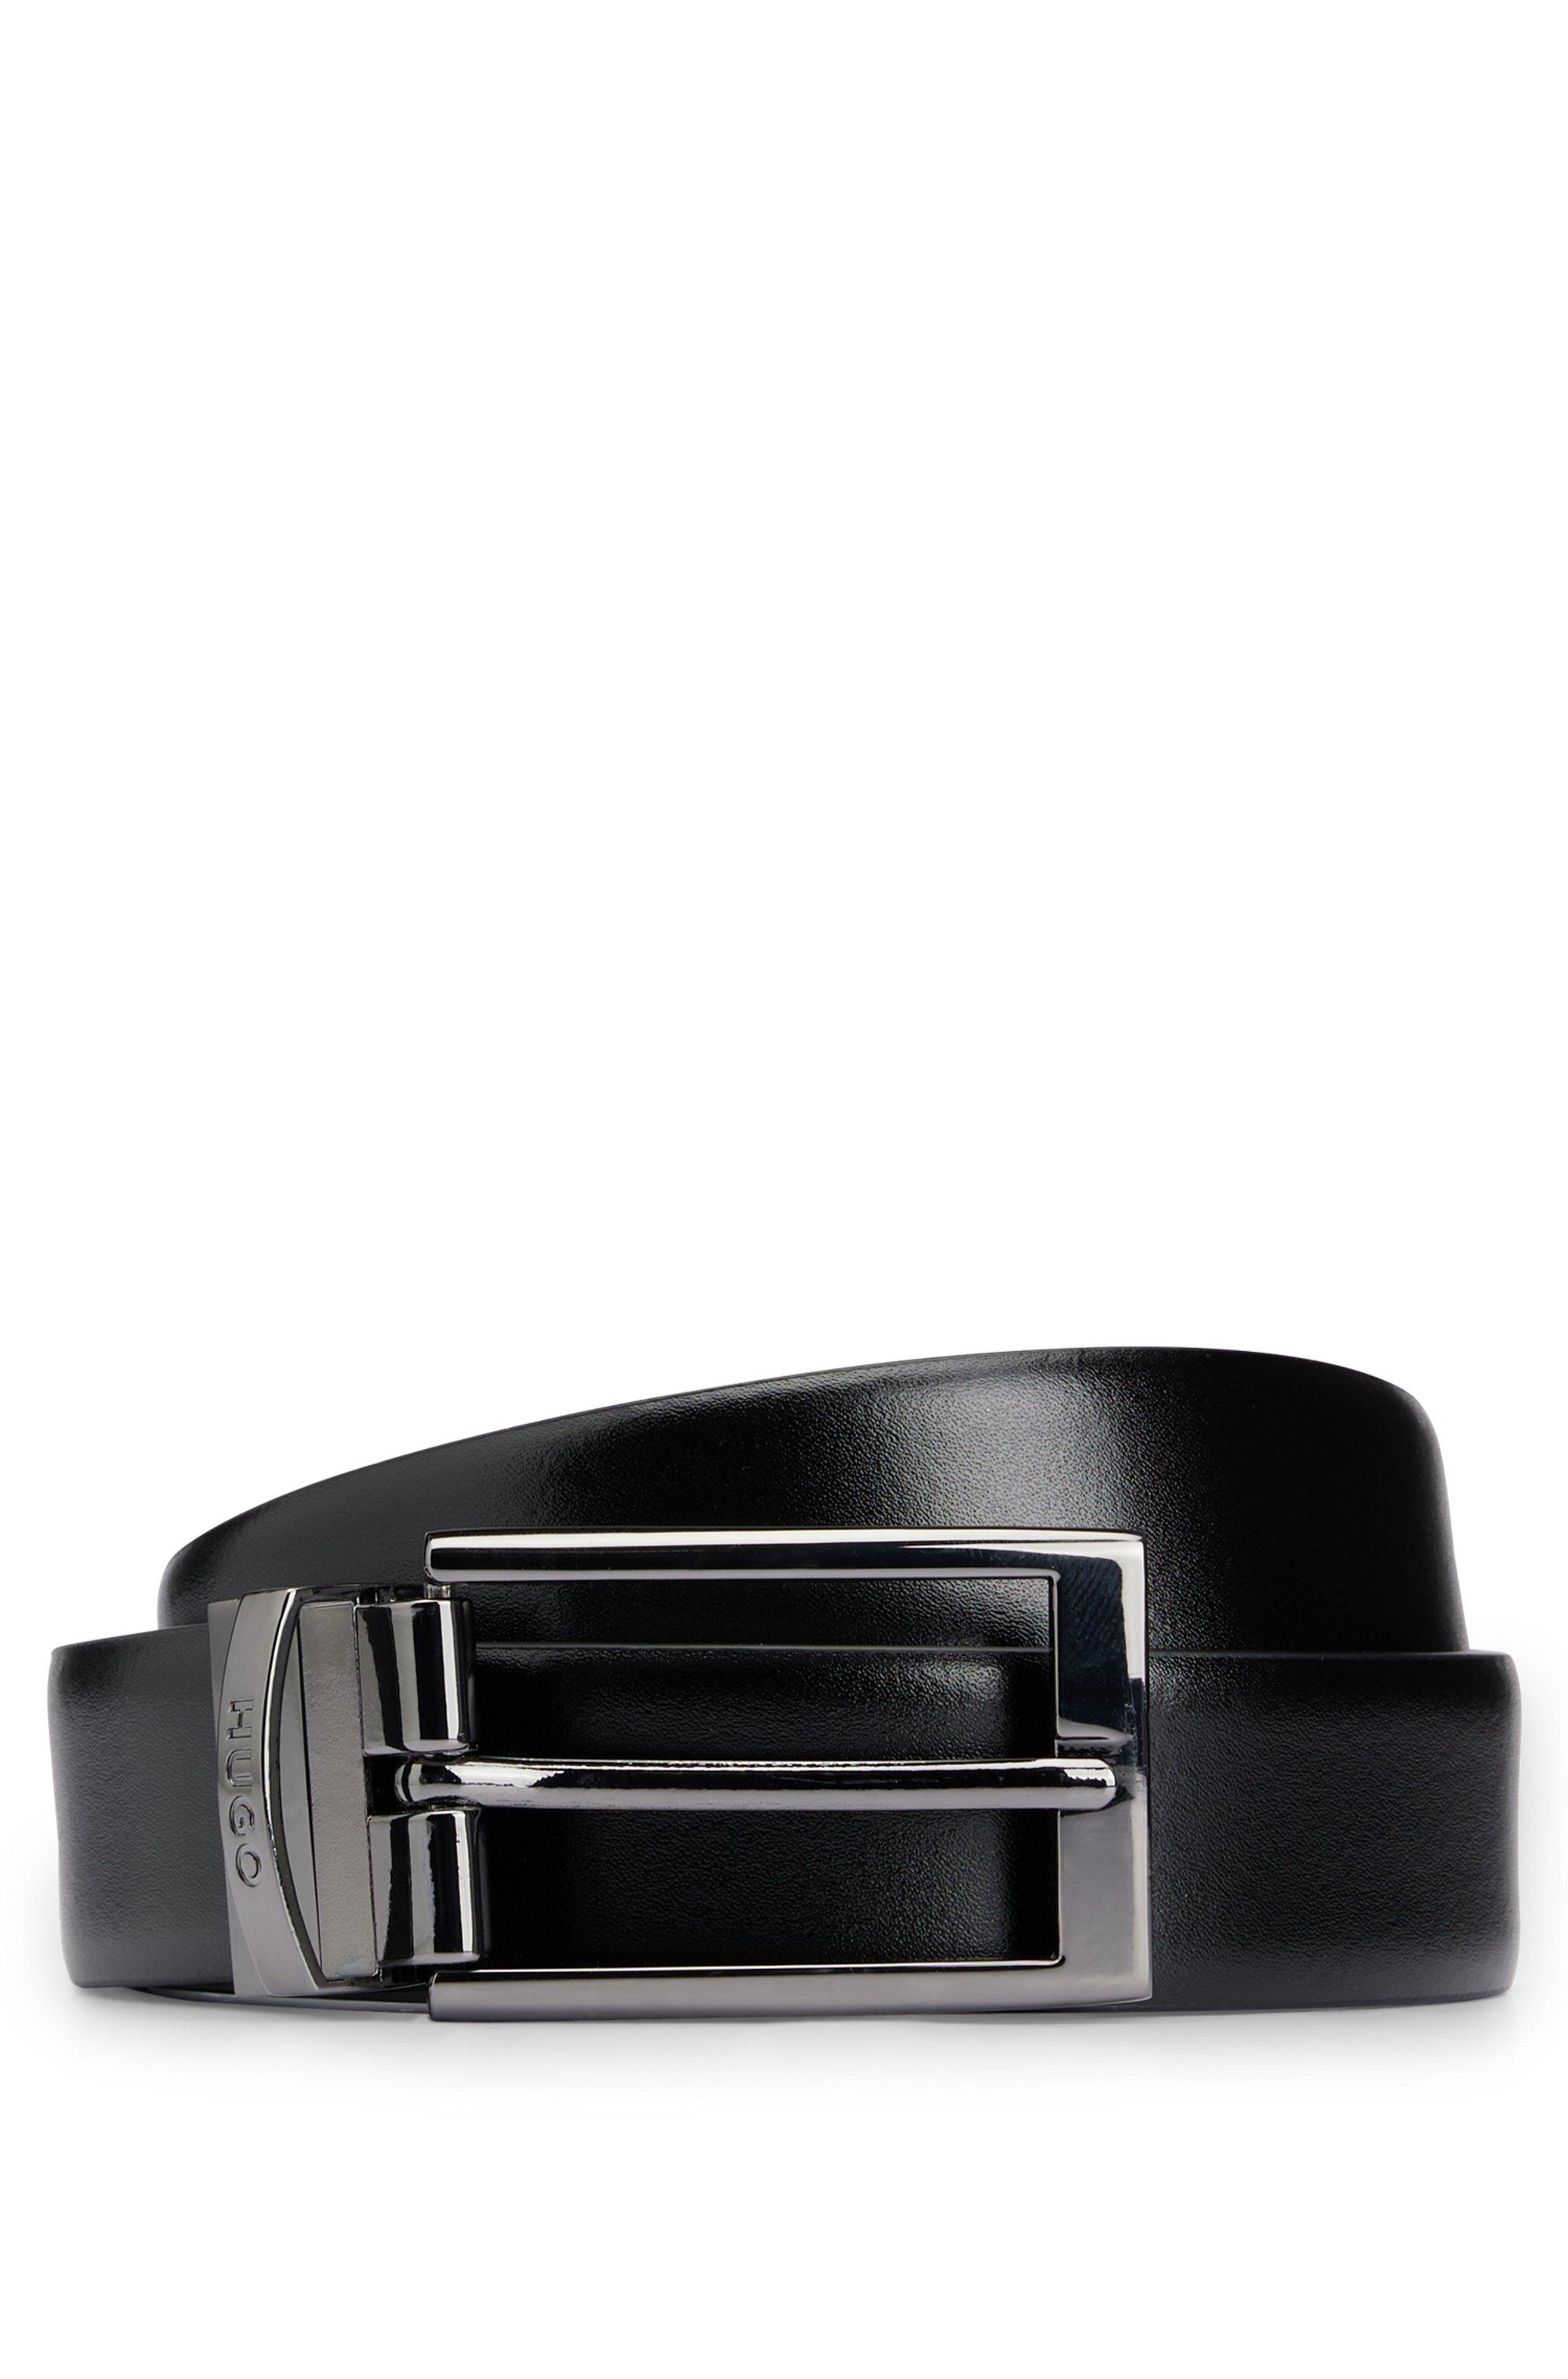 Reversible leather belt with polished gunmetal hardware, Black